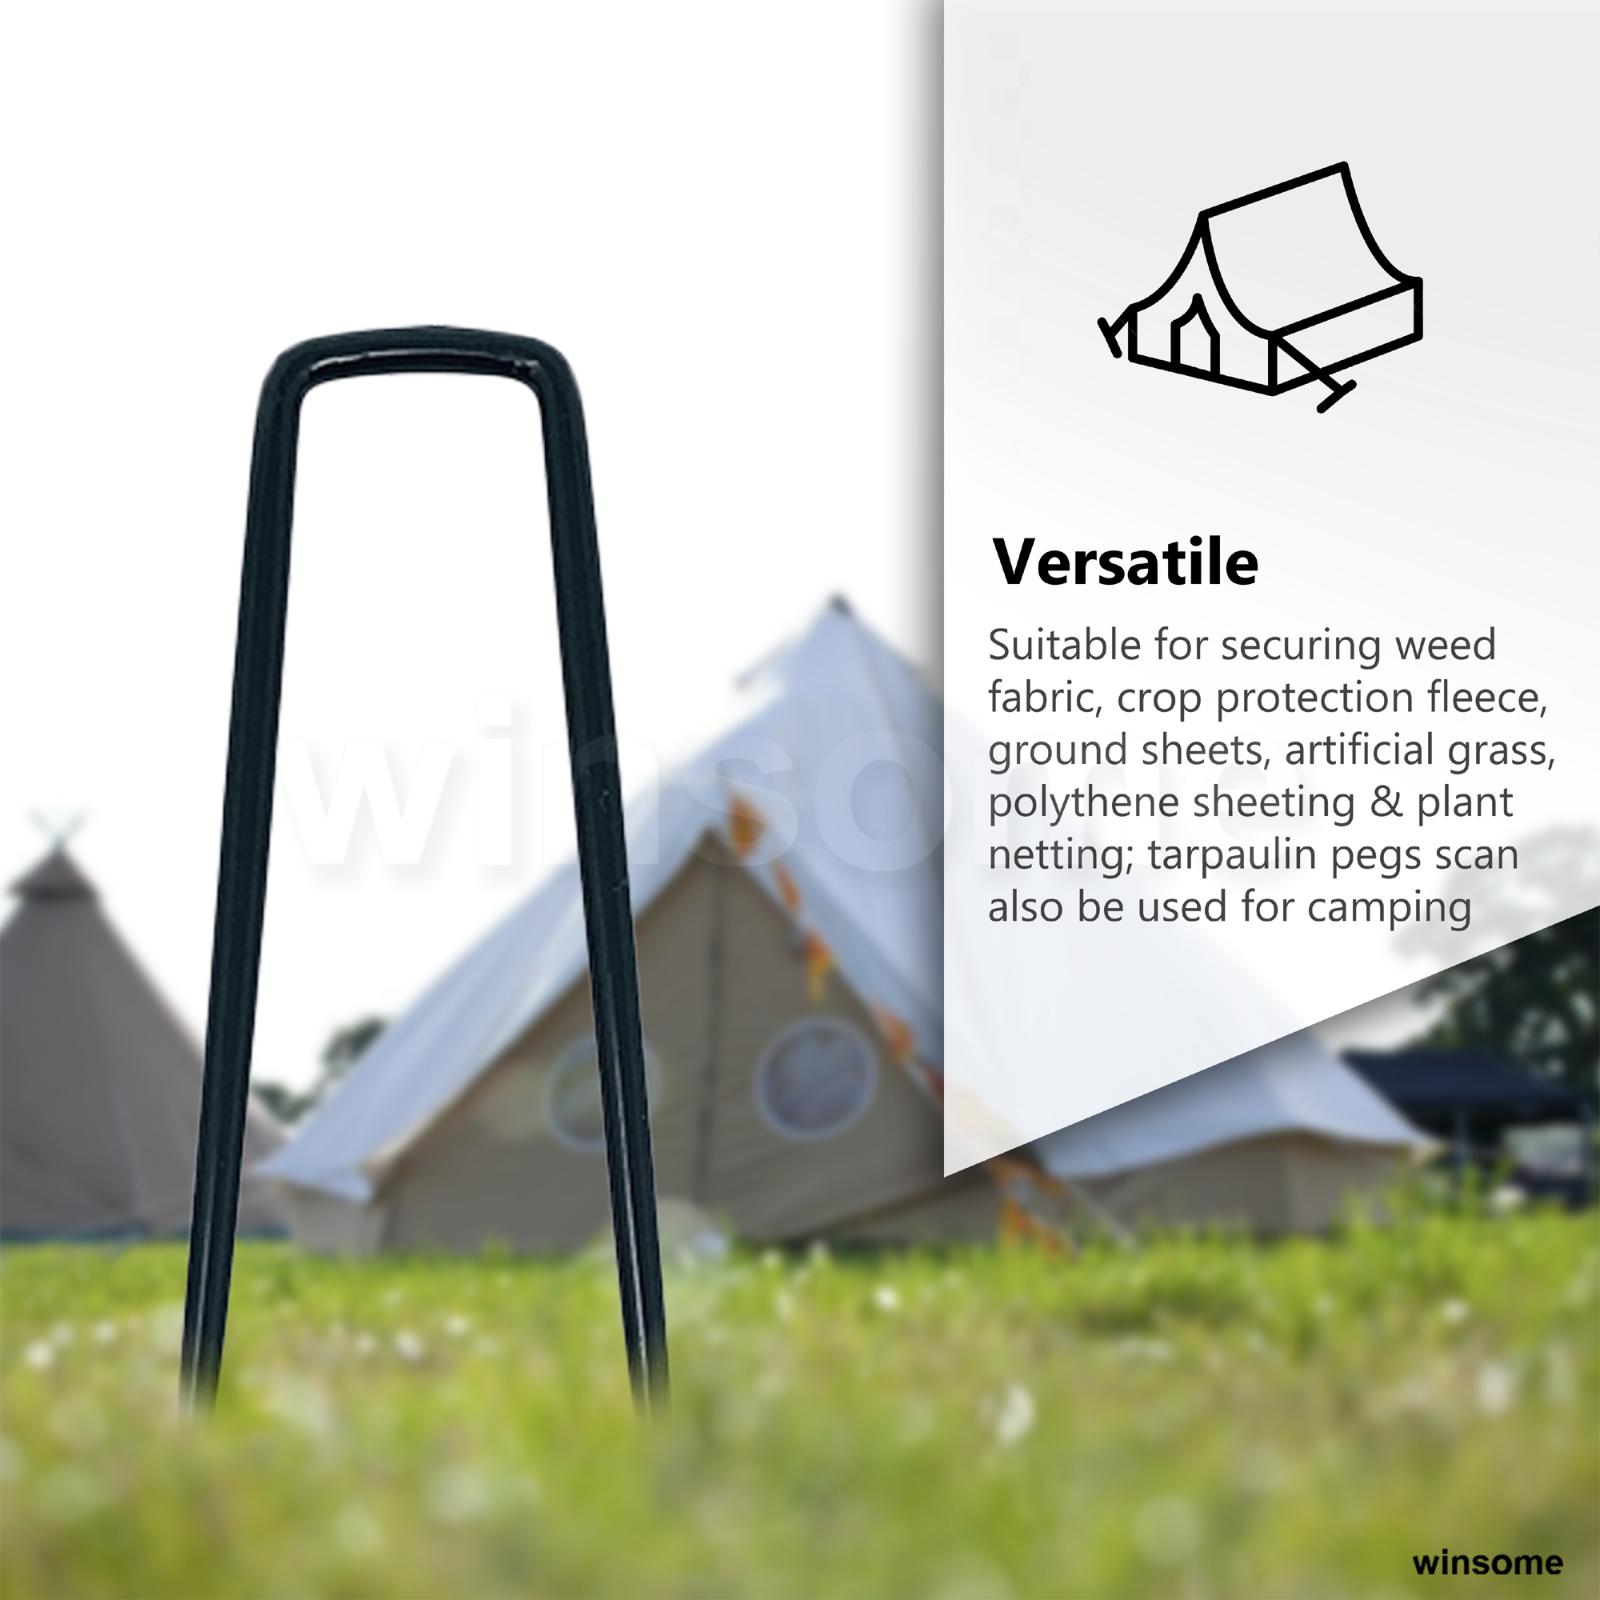 20 Garden Metal Fabric Tent Gazebo Awning Staples Pegs Ground Hooks 14.5 x 5cm